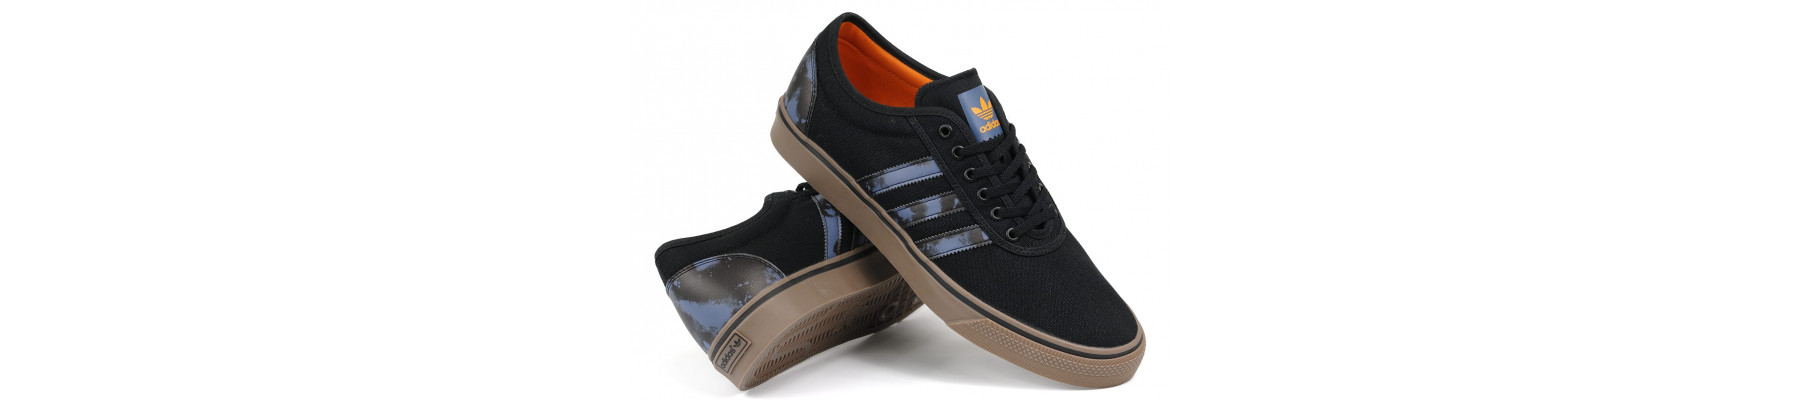 Adidas Skateboarding Adi-Ease CBlackBorang